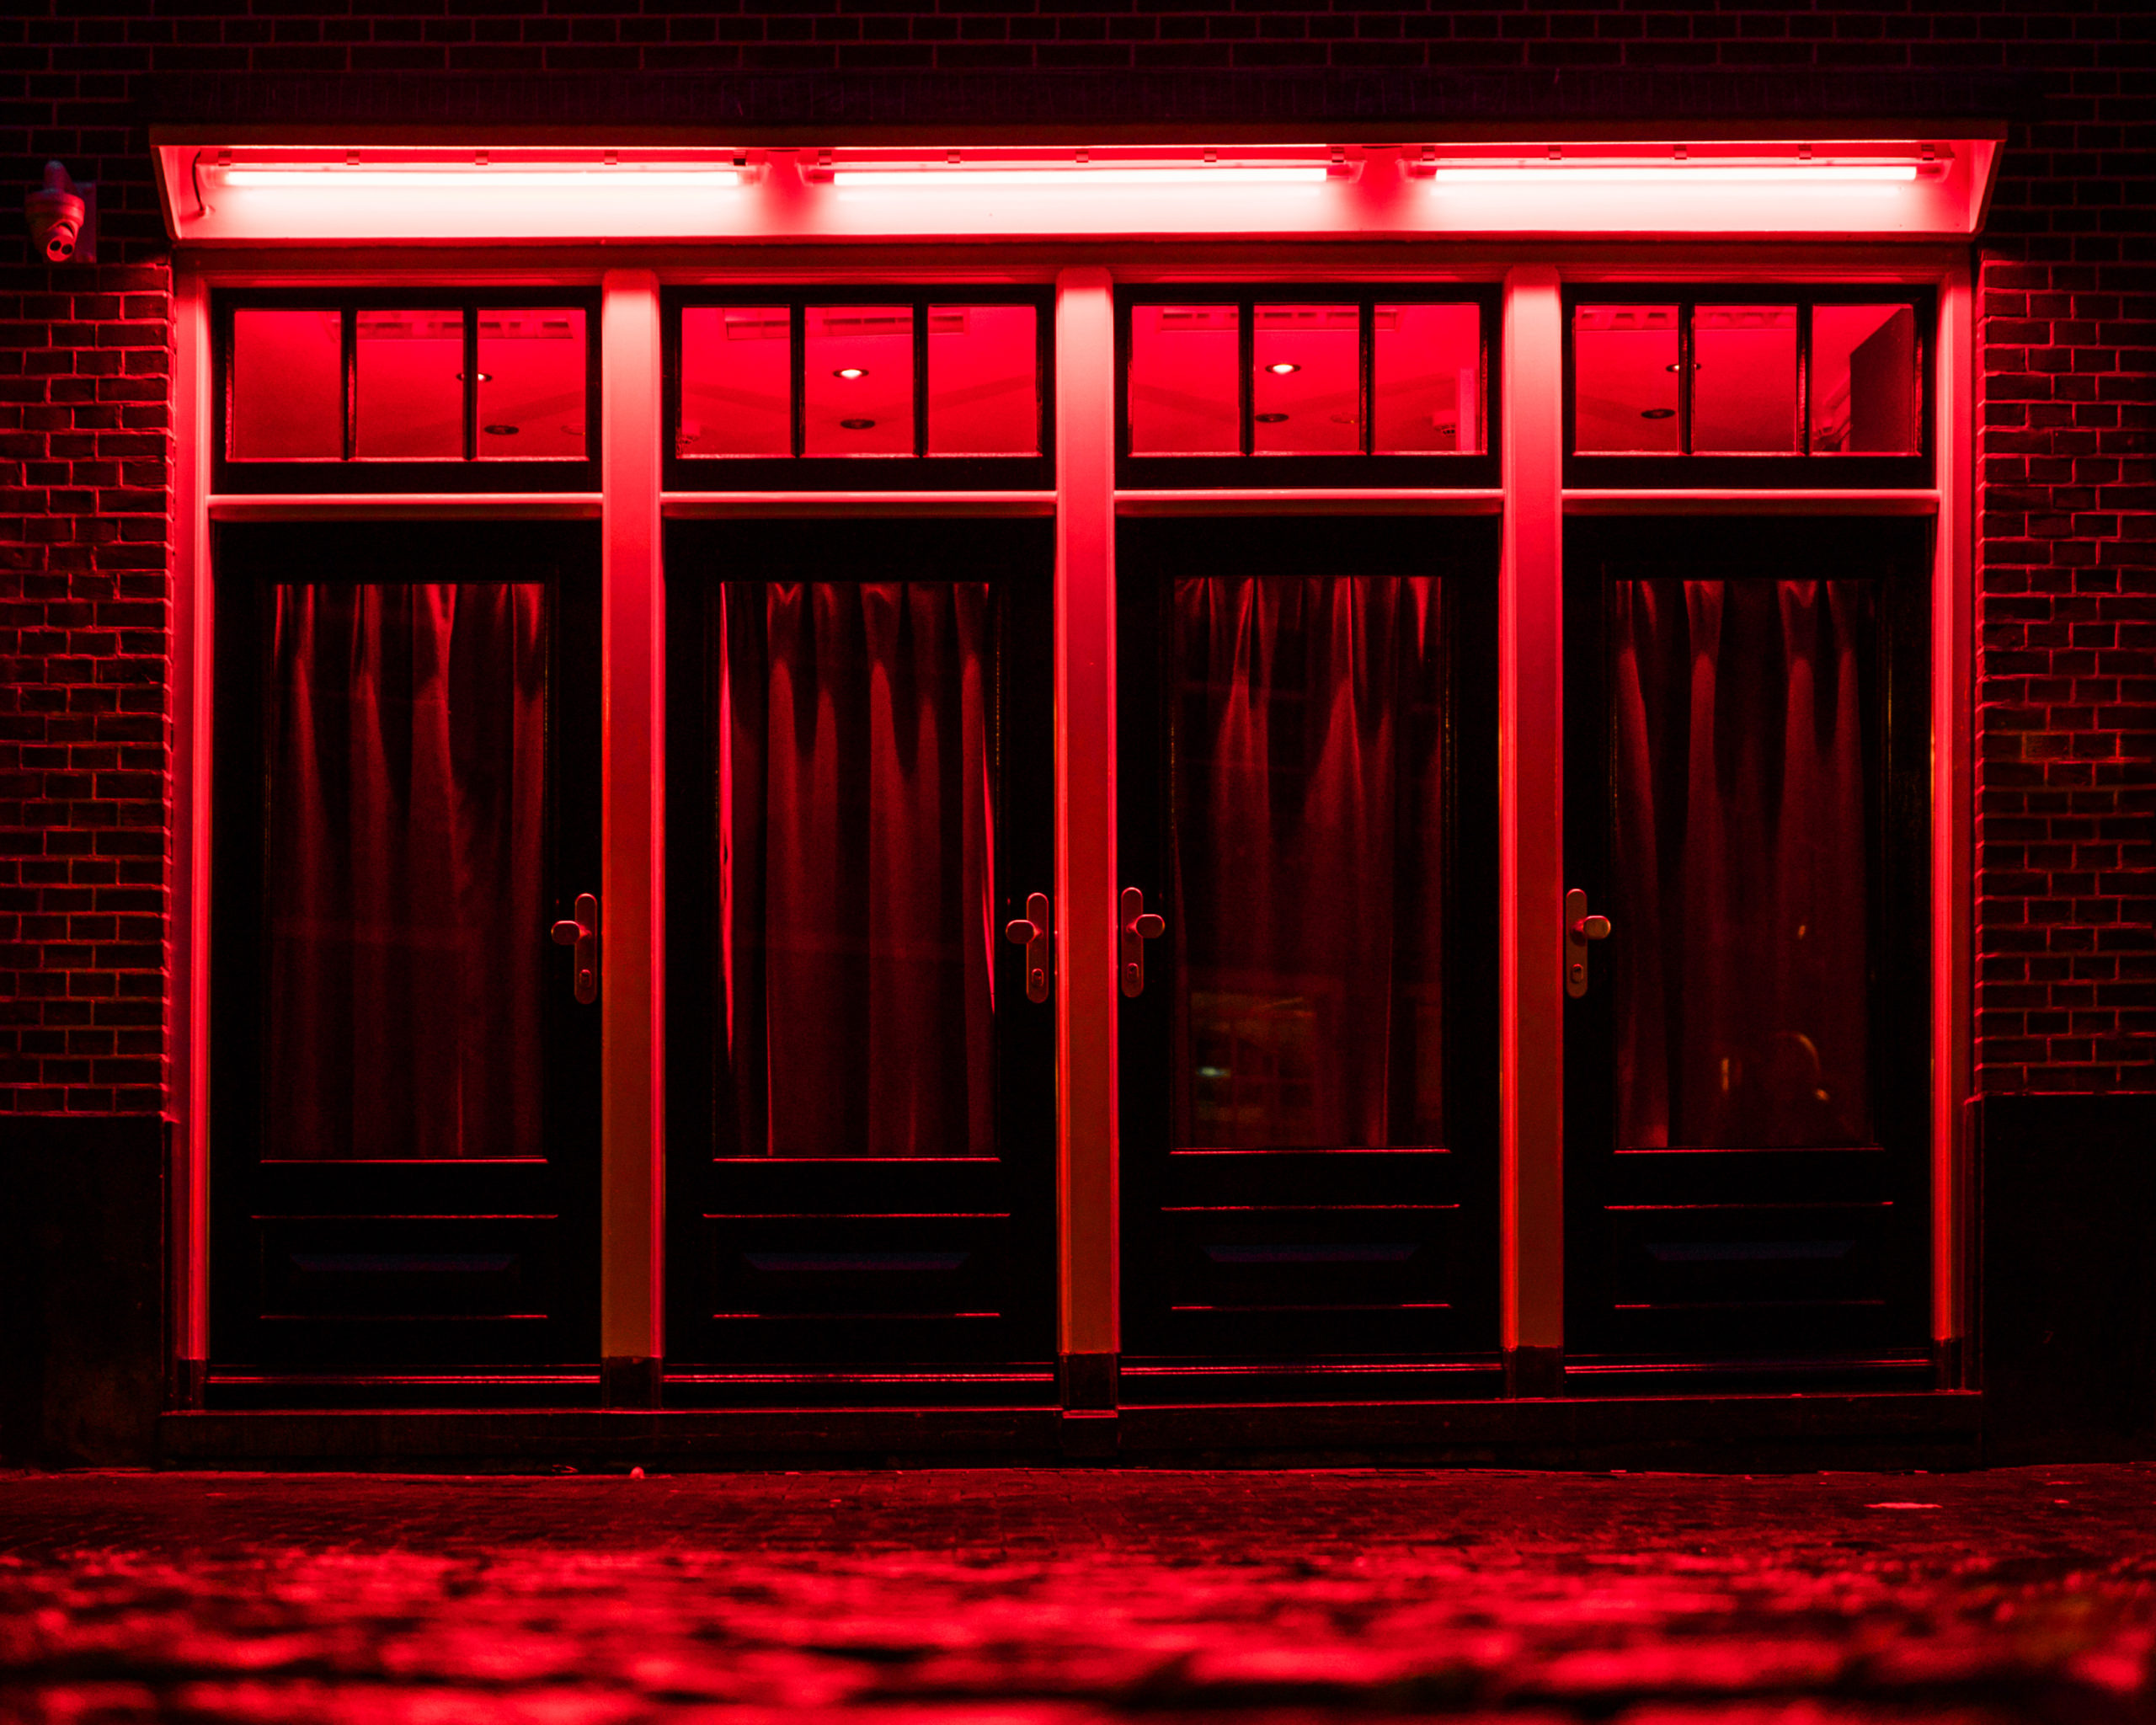 prostitution sex work depenalisation legalisation amsterdam red lights district